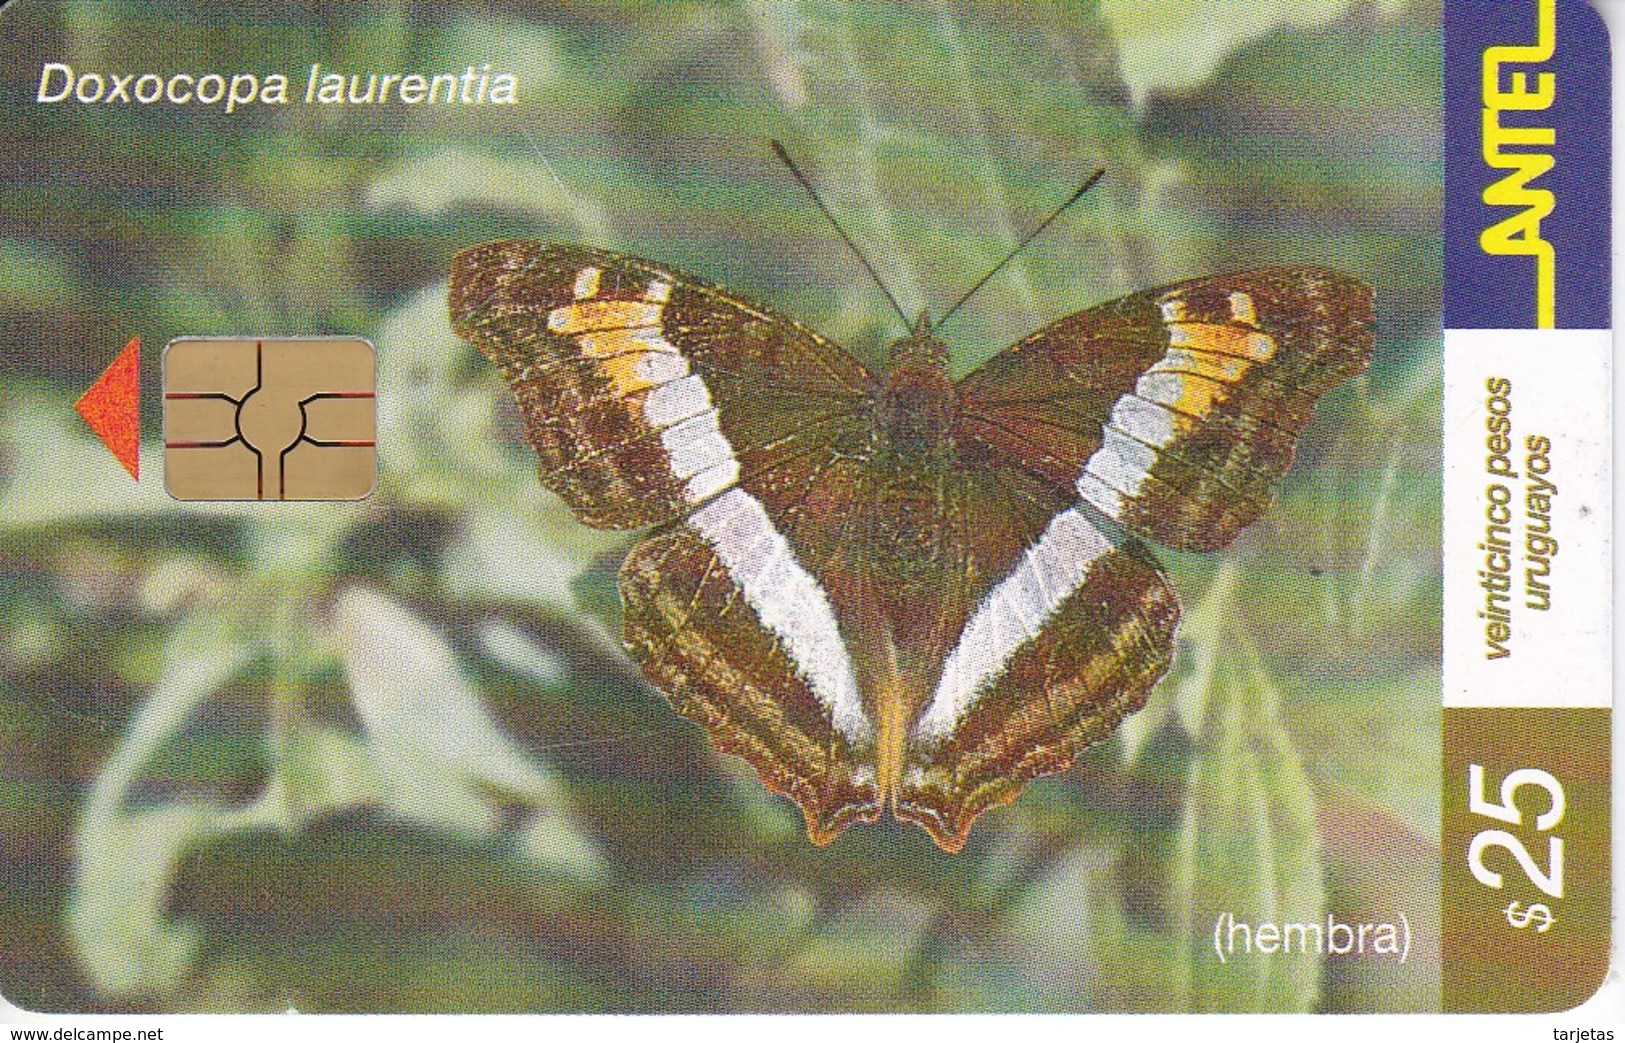 Nº 185 TARJETA DE URUGUAY DE ANTEL DE UNA DOXOCOPA LAURENTIA (MARIPOSA-BUTTERFLY) CHIP ROJO - Uruguay